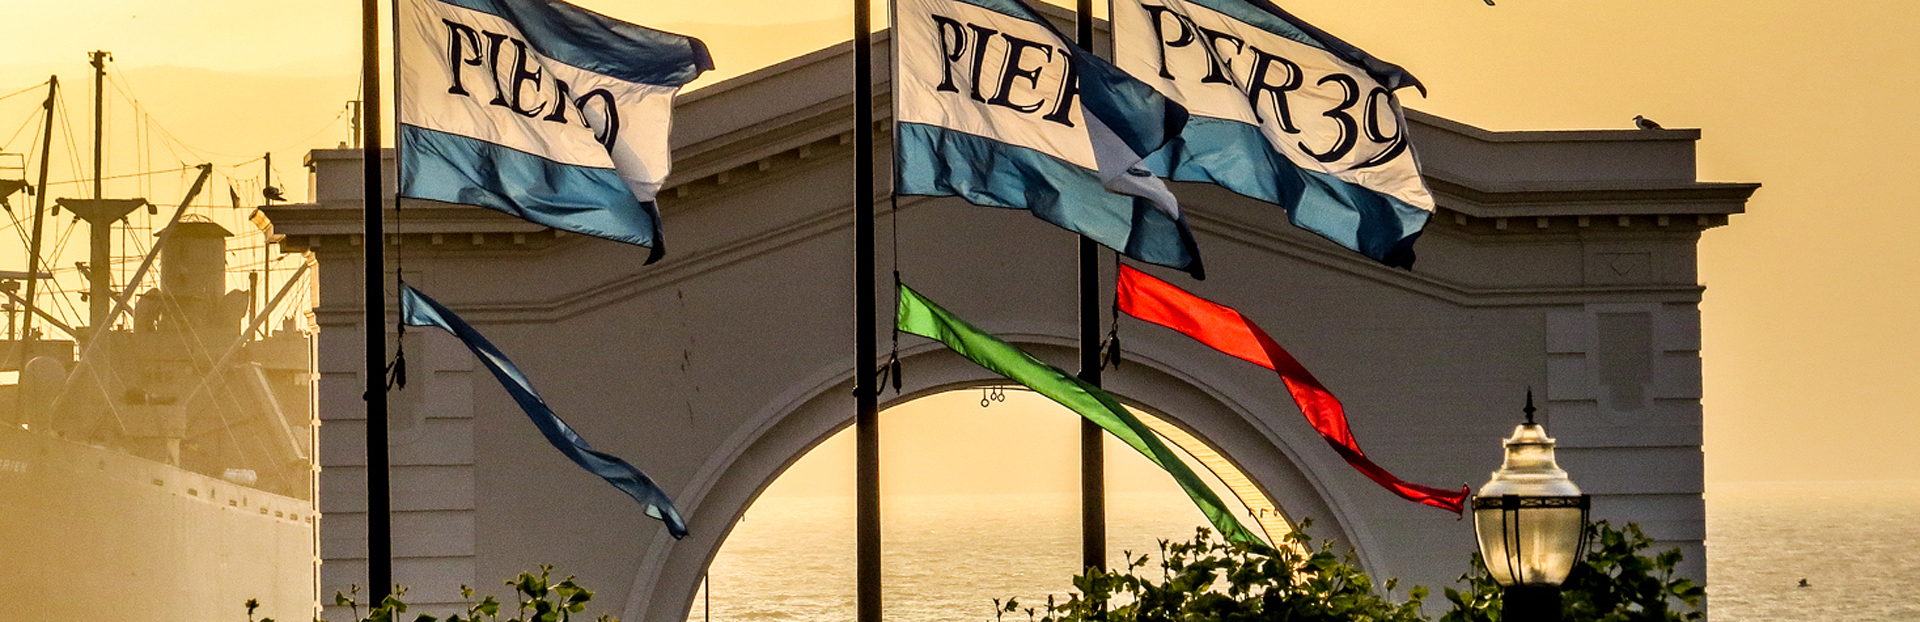 Pier 39 sunset